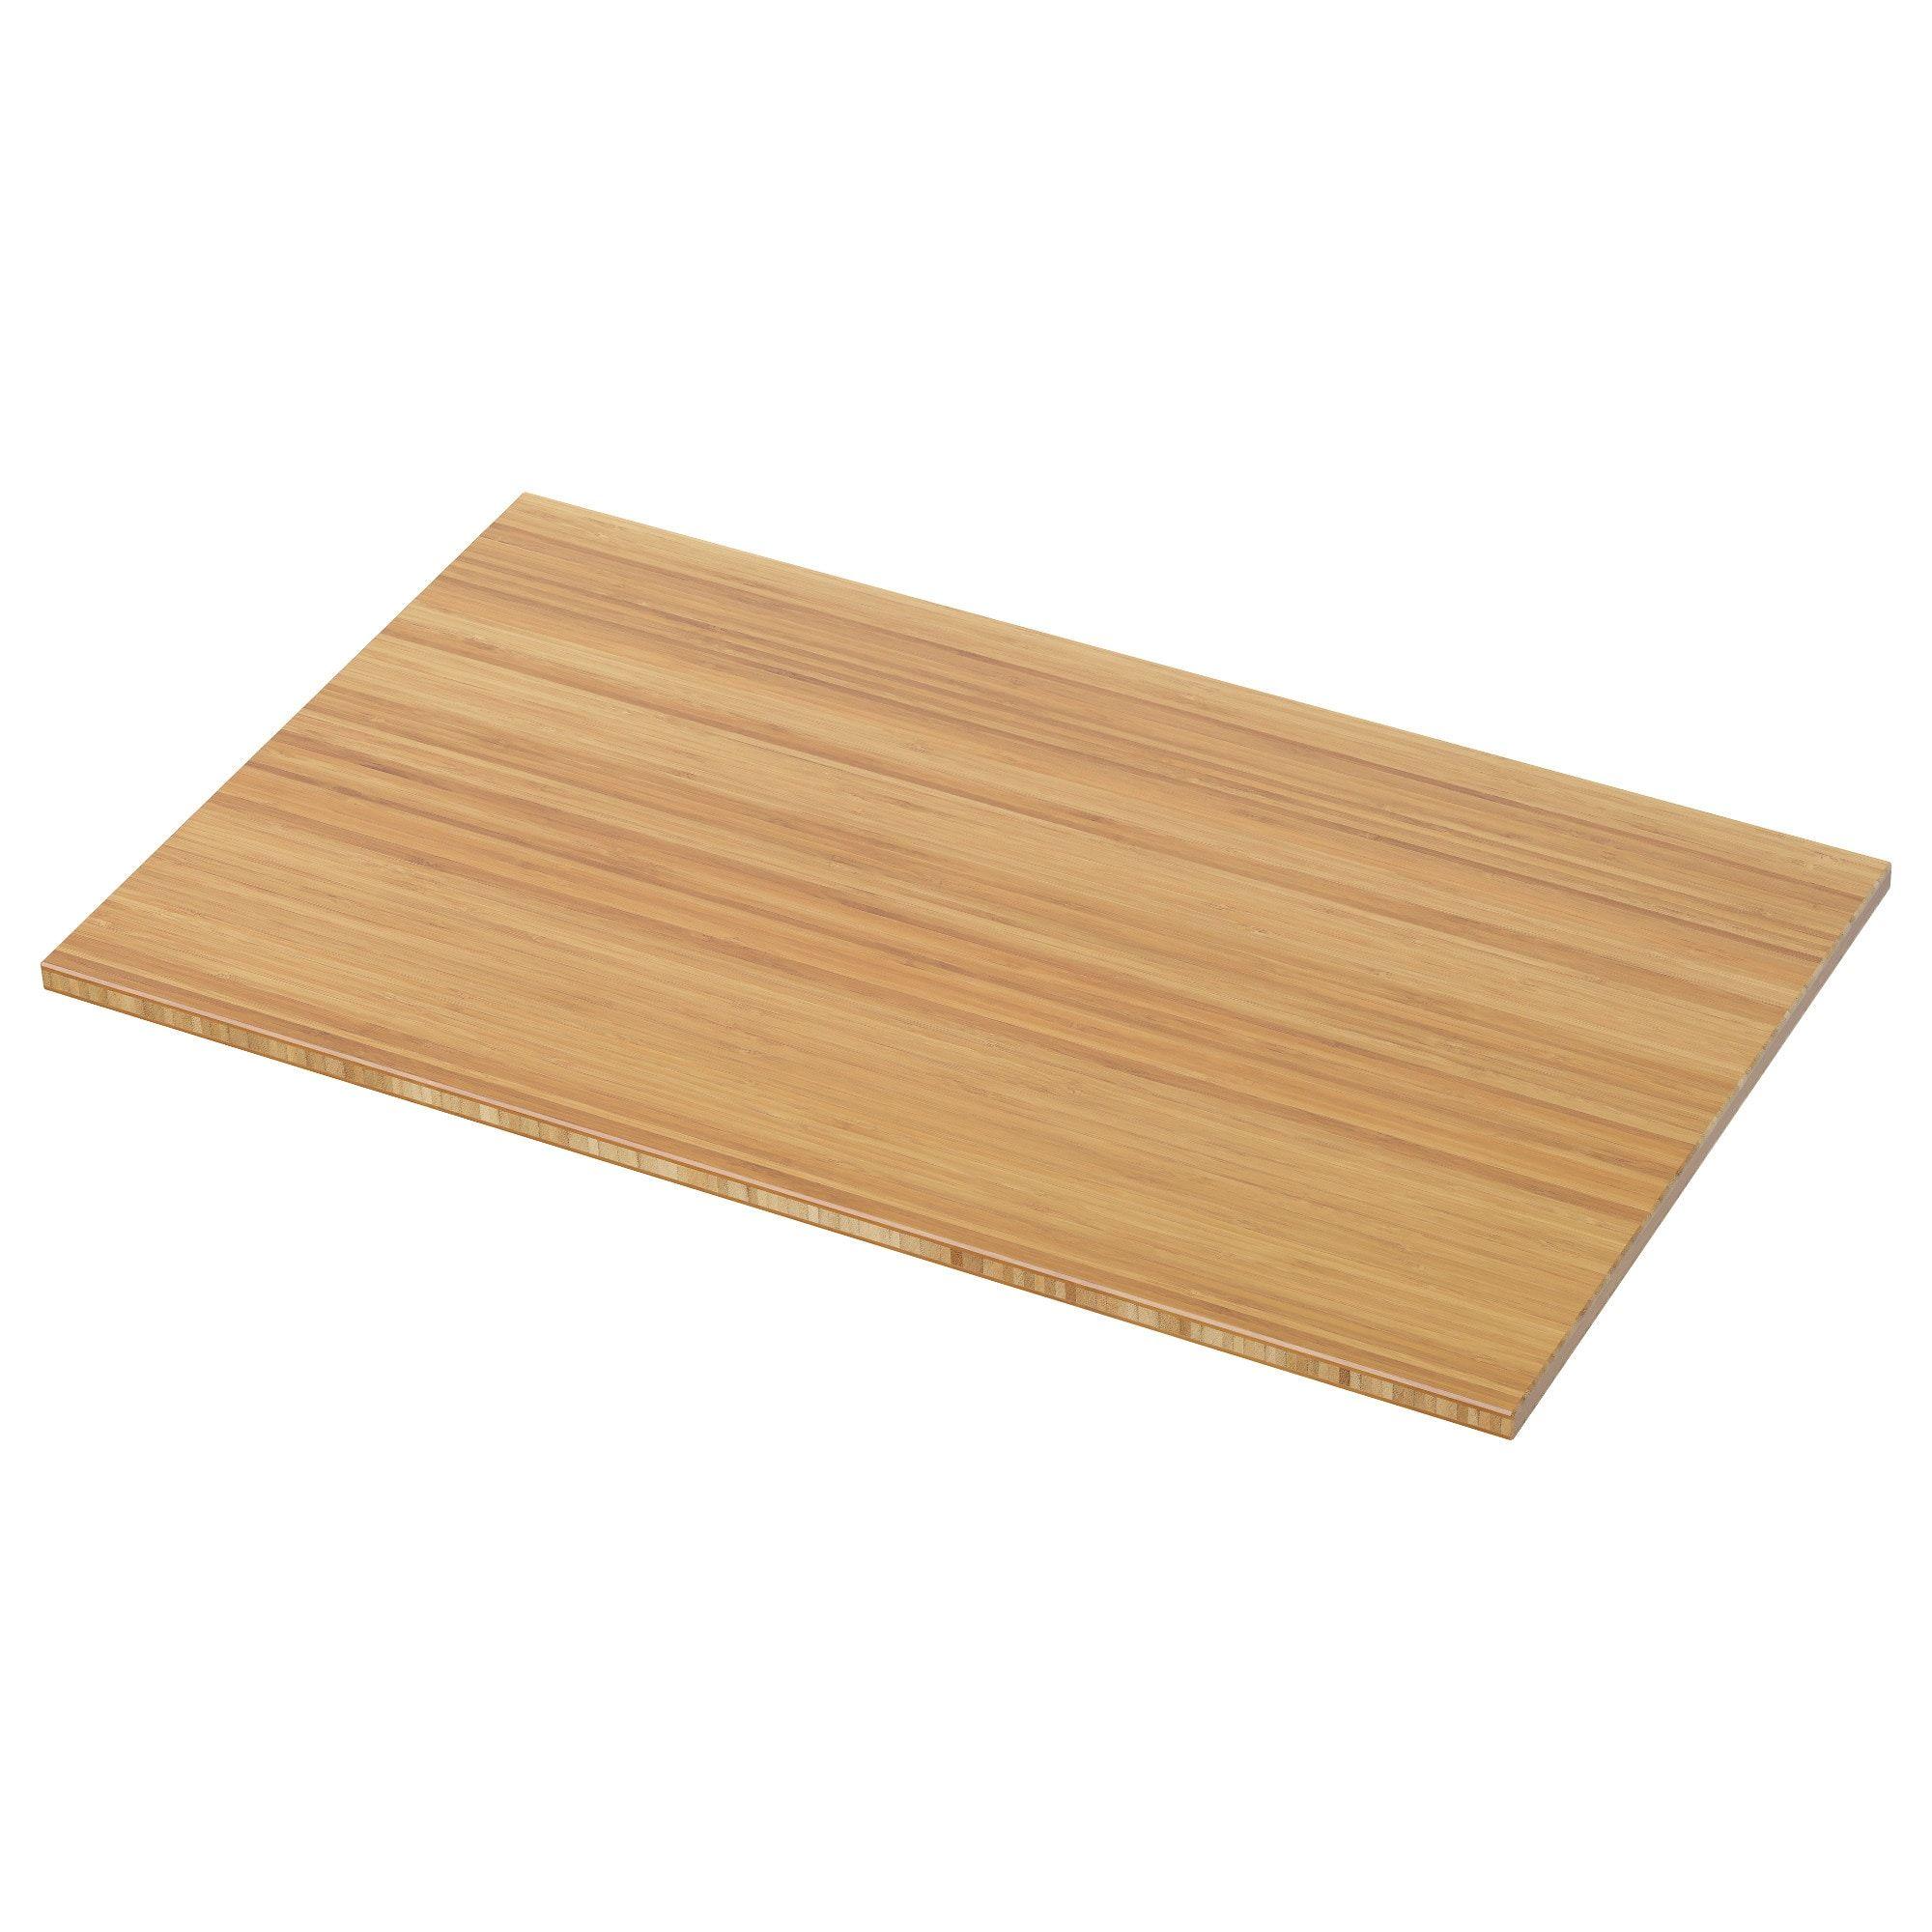 Tolken Countertop Bamboo Shop Here Ikea Bamboo Countertop Countertops Ikea